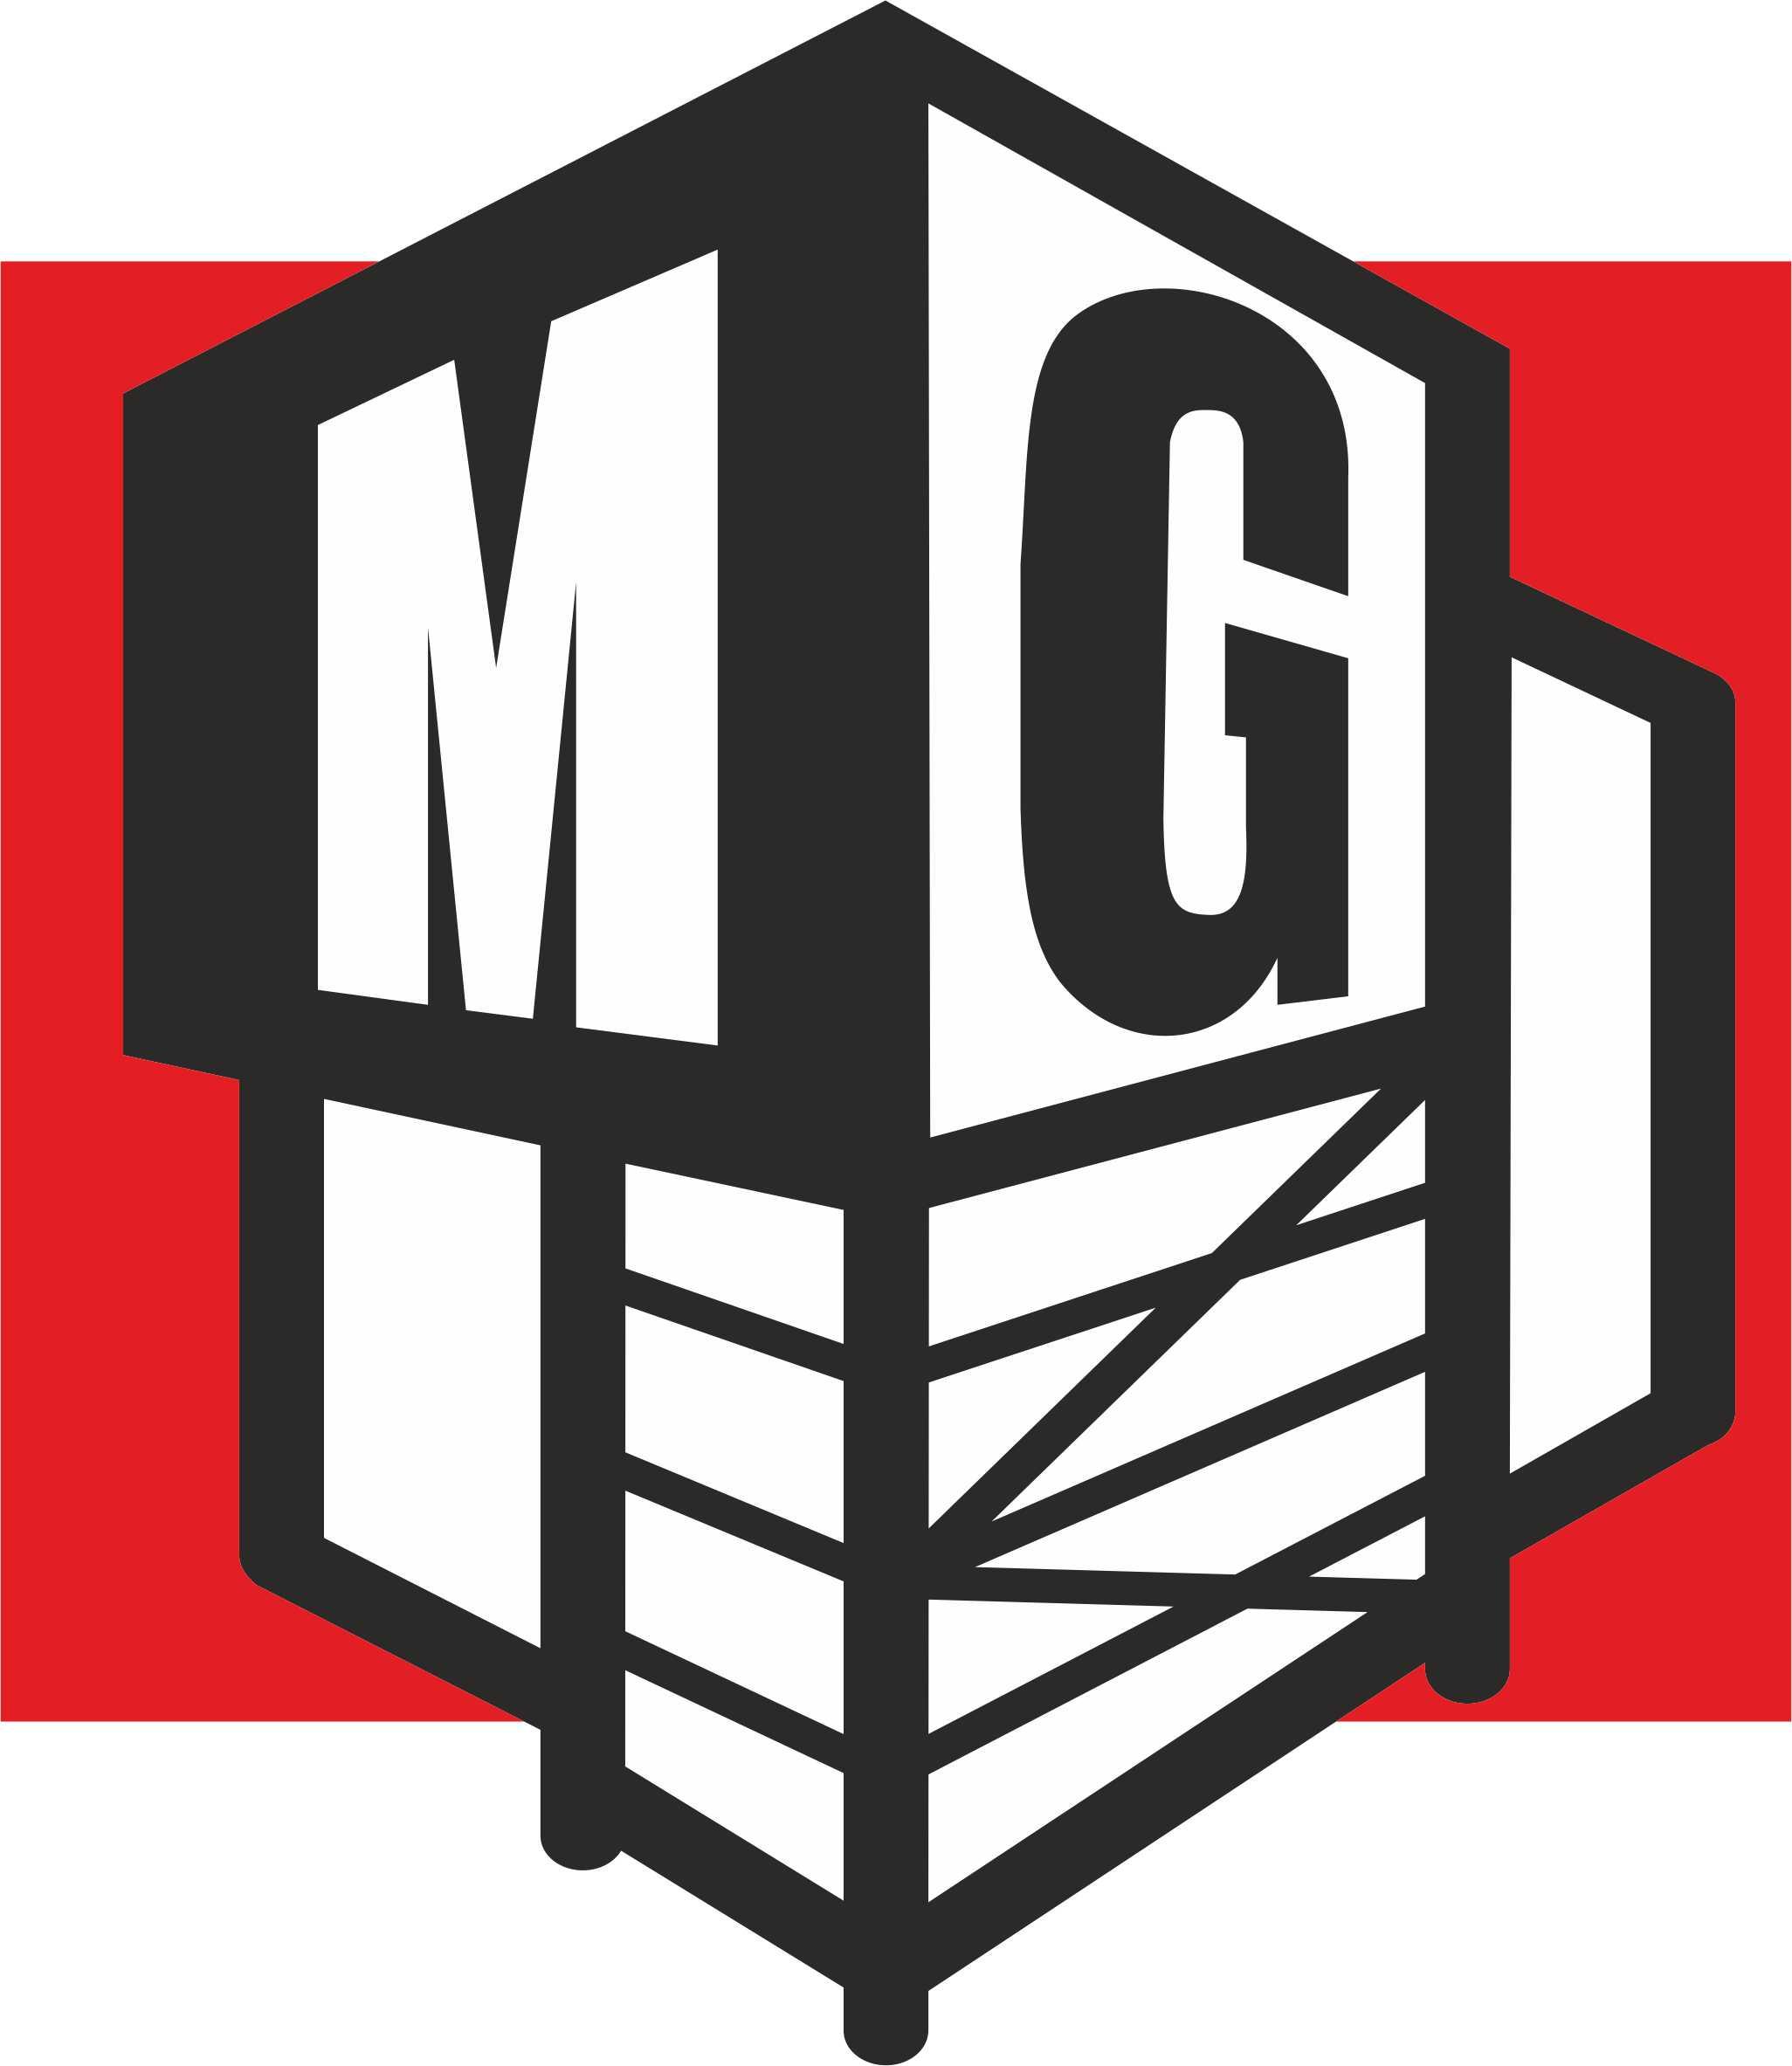 Menke Gerüstbau GmbH